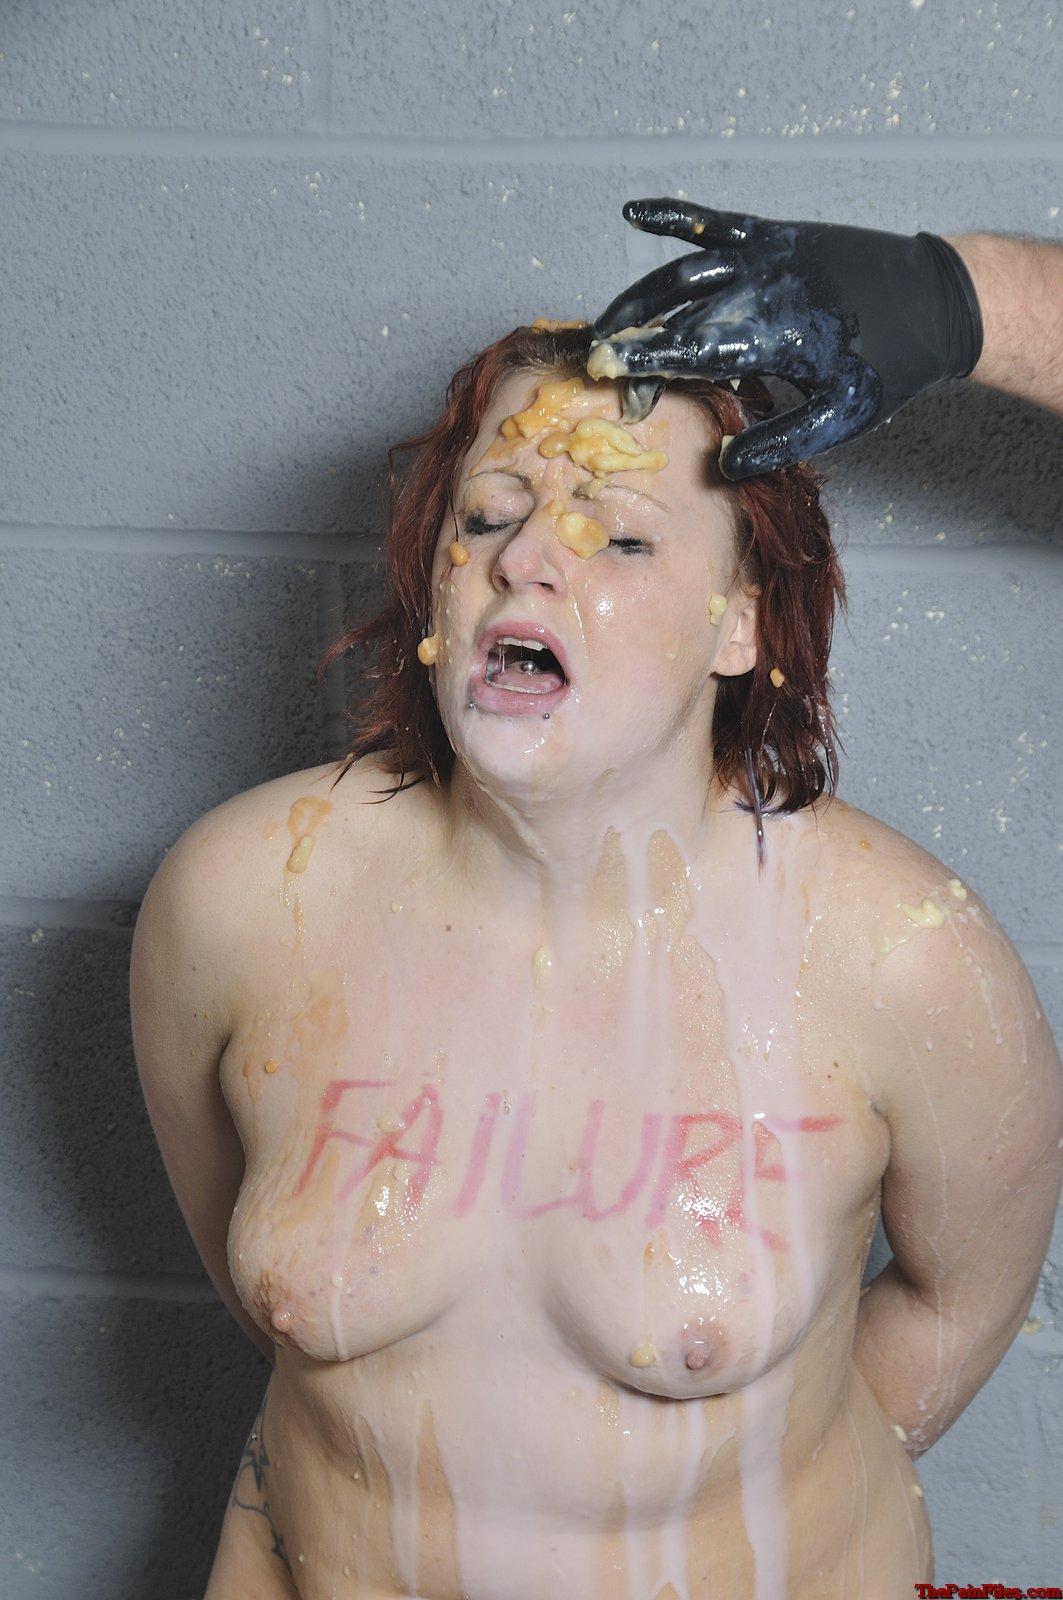 Sperm humiliation